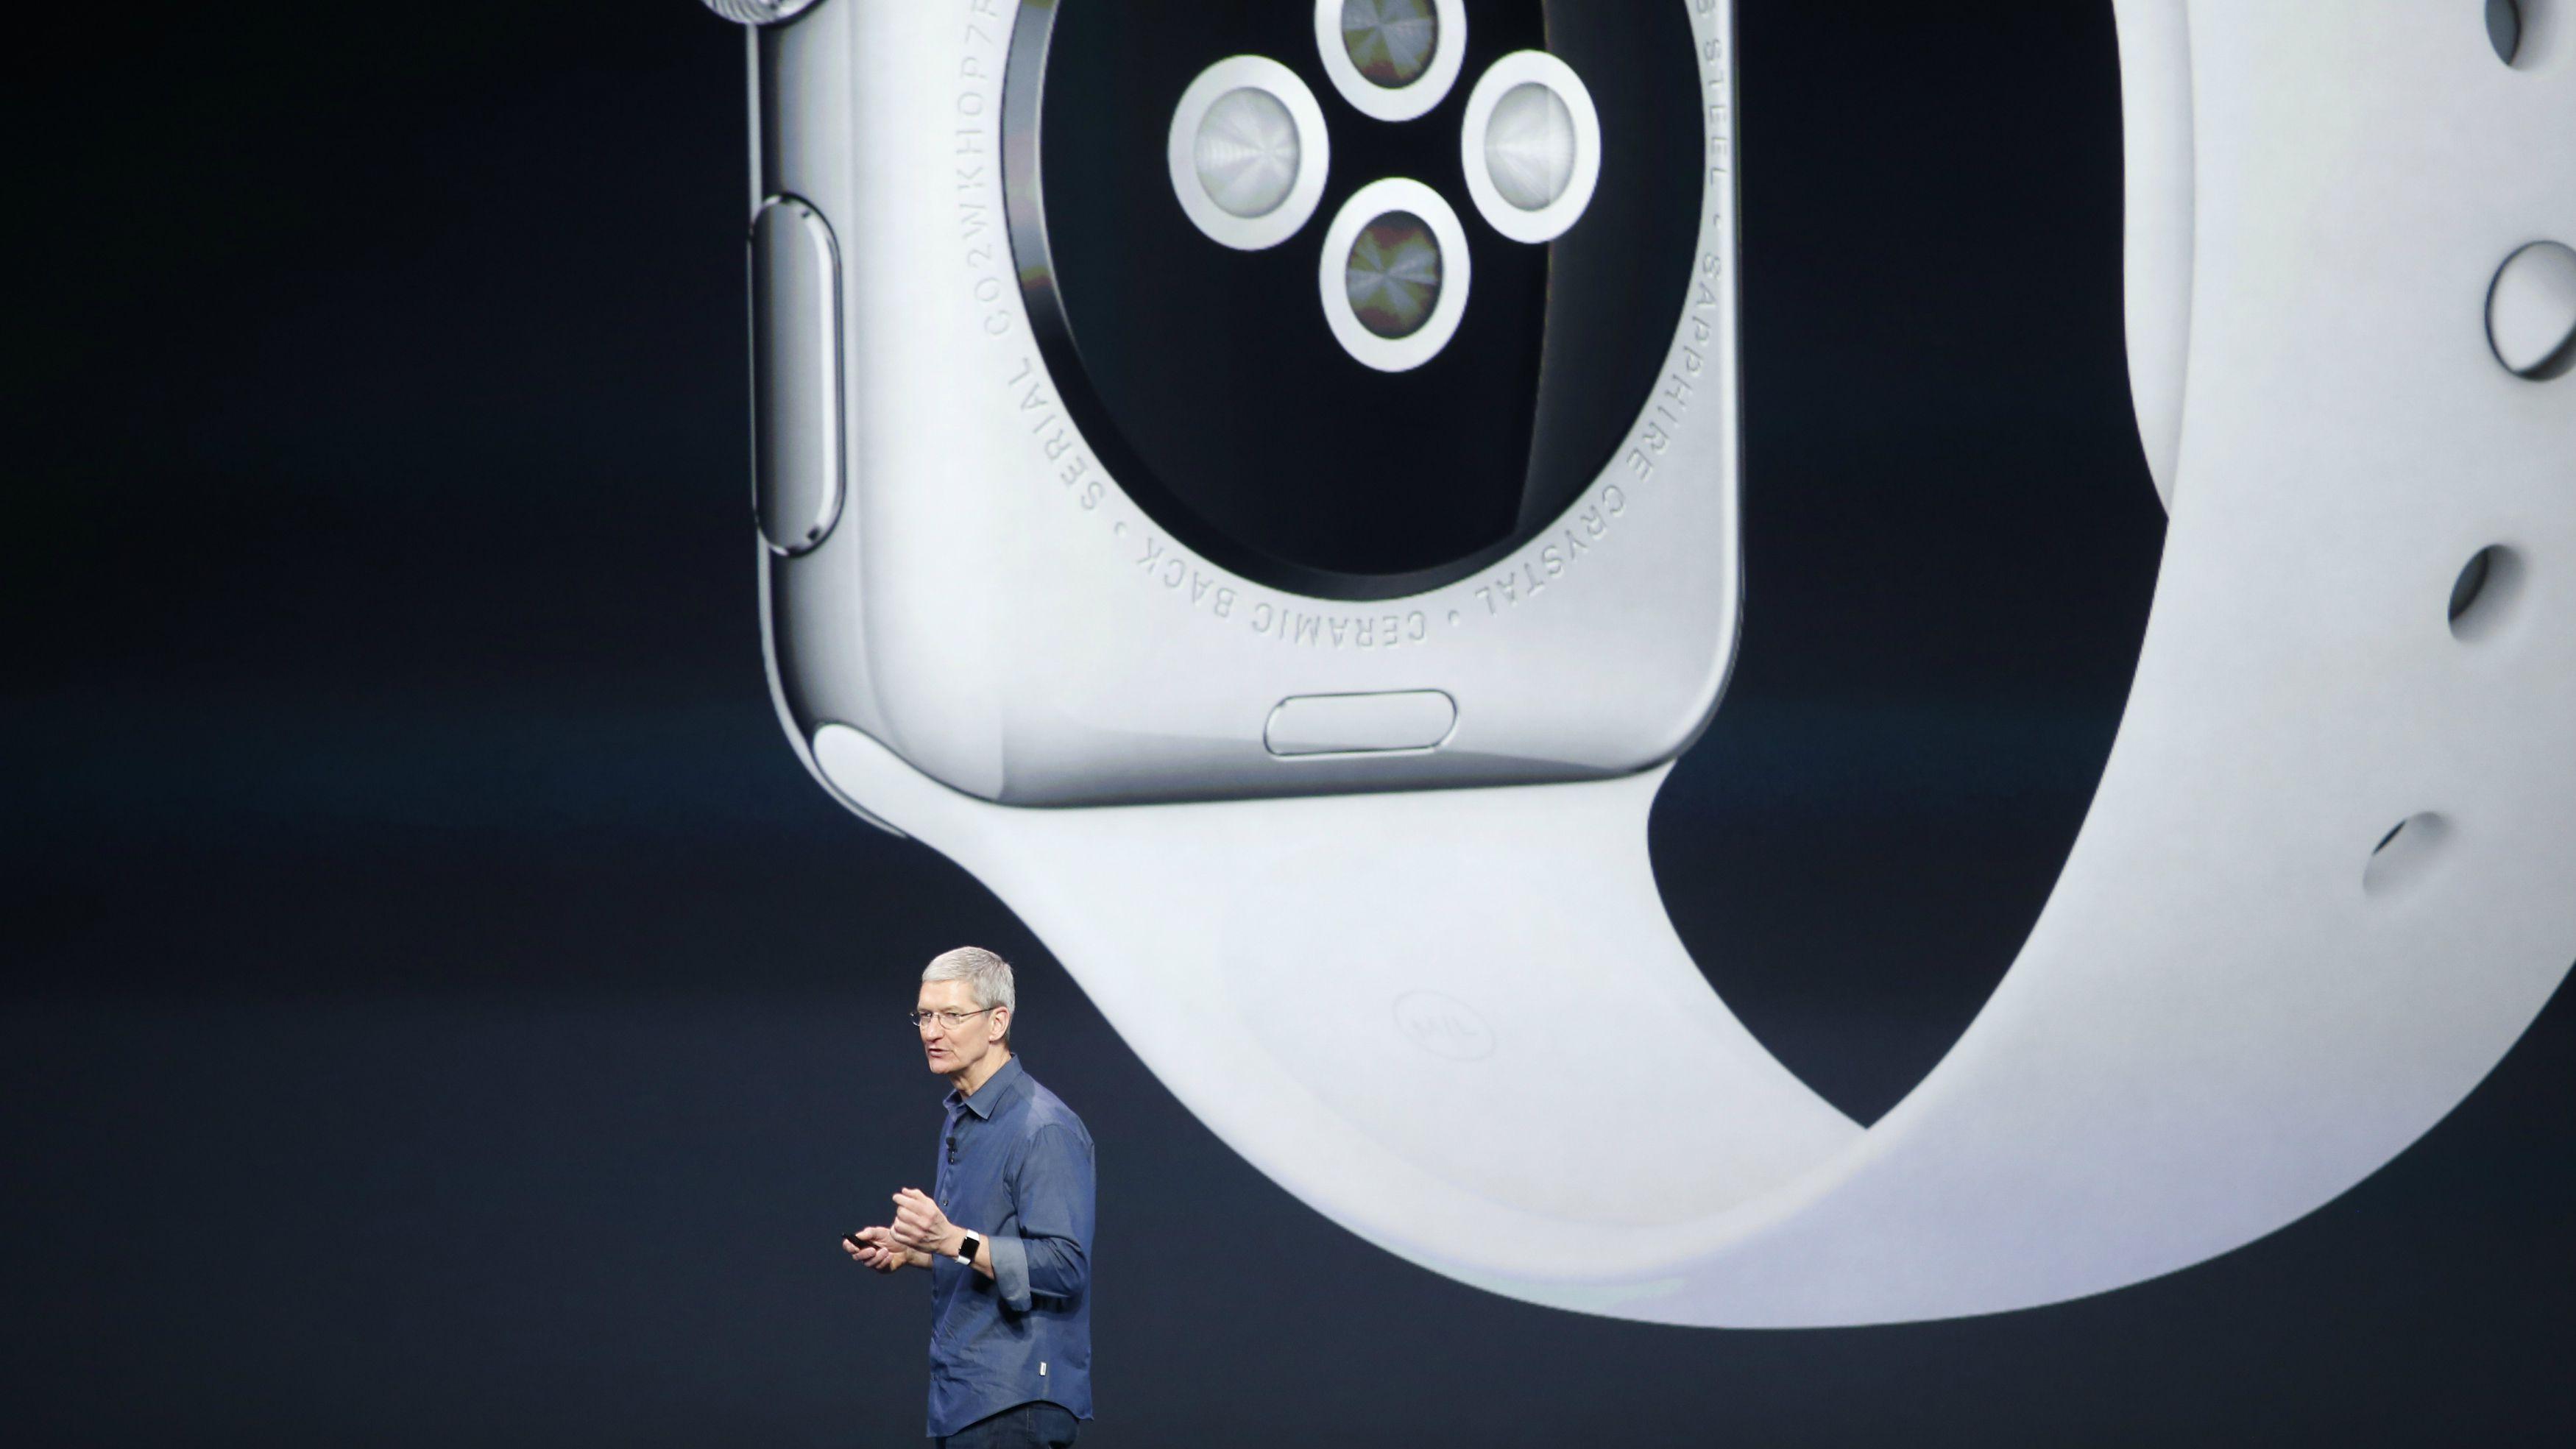 apple watch tim cook wearables wearable technology